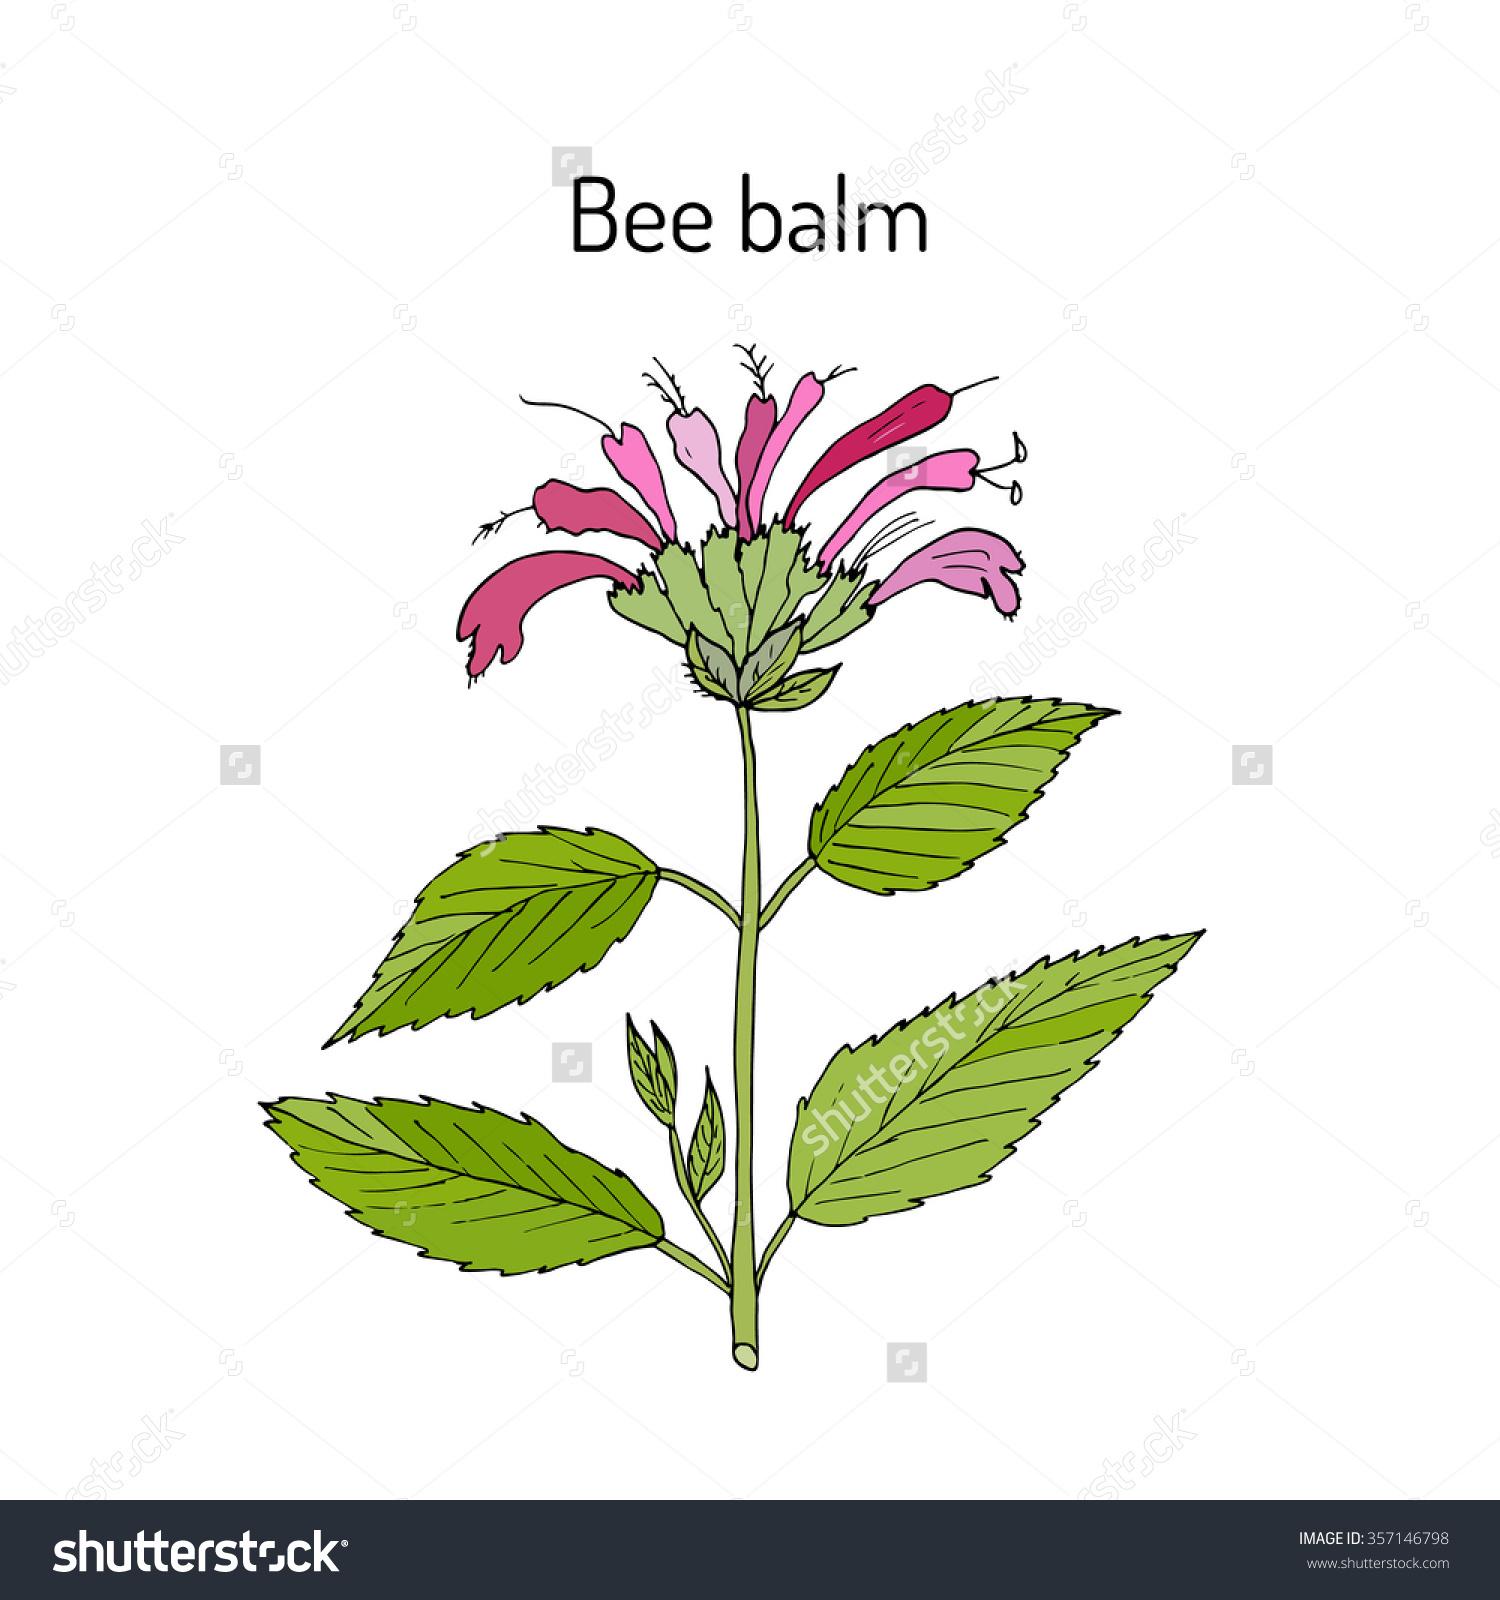 Wild Bergamot Bee Balm Aromatic Medicinal Stock Vector 357146798.